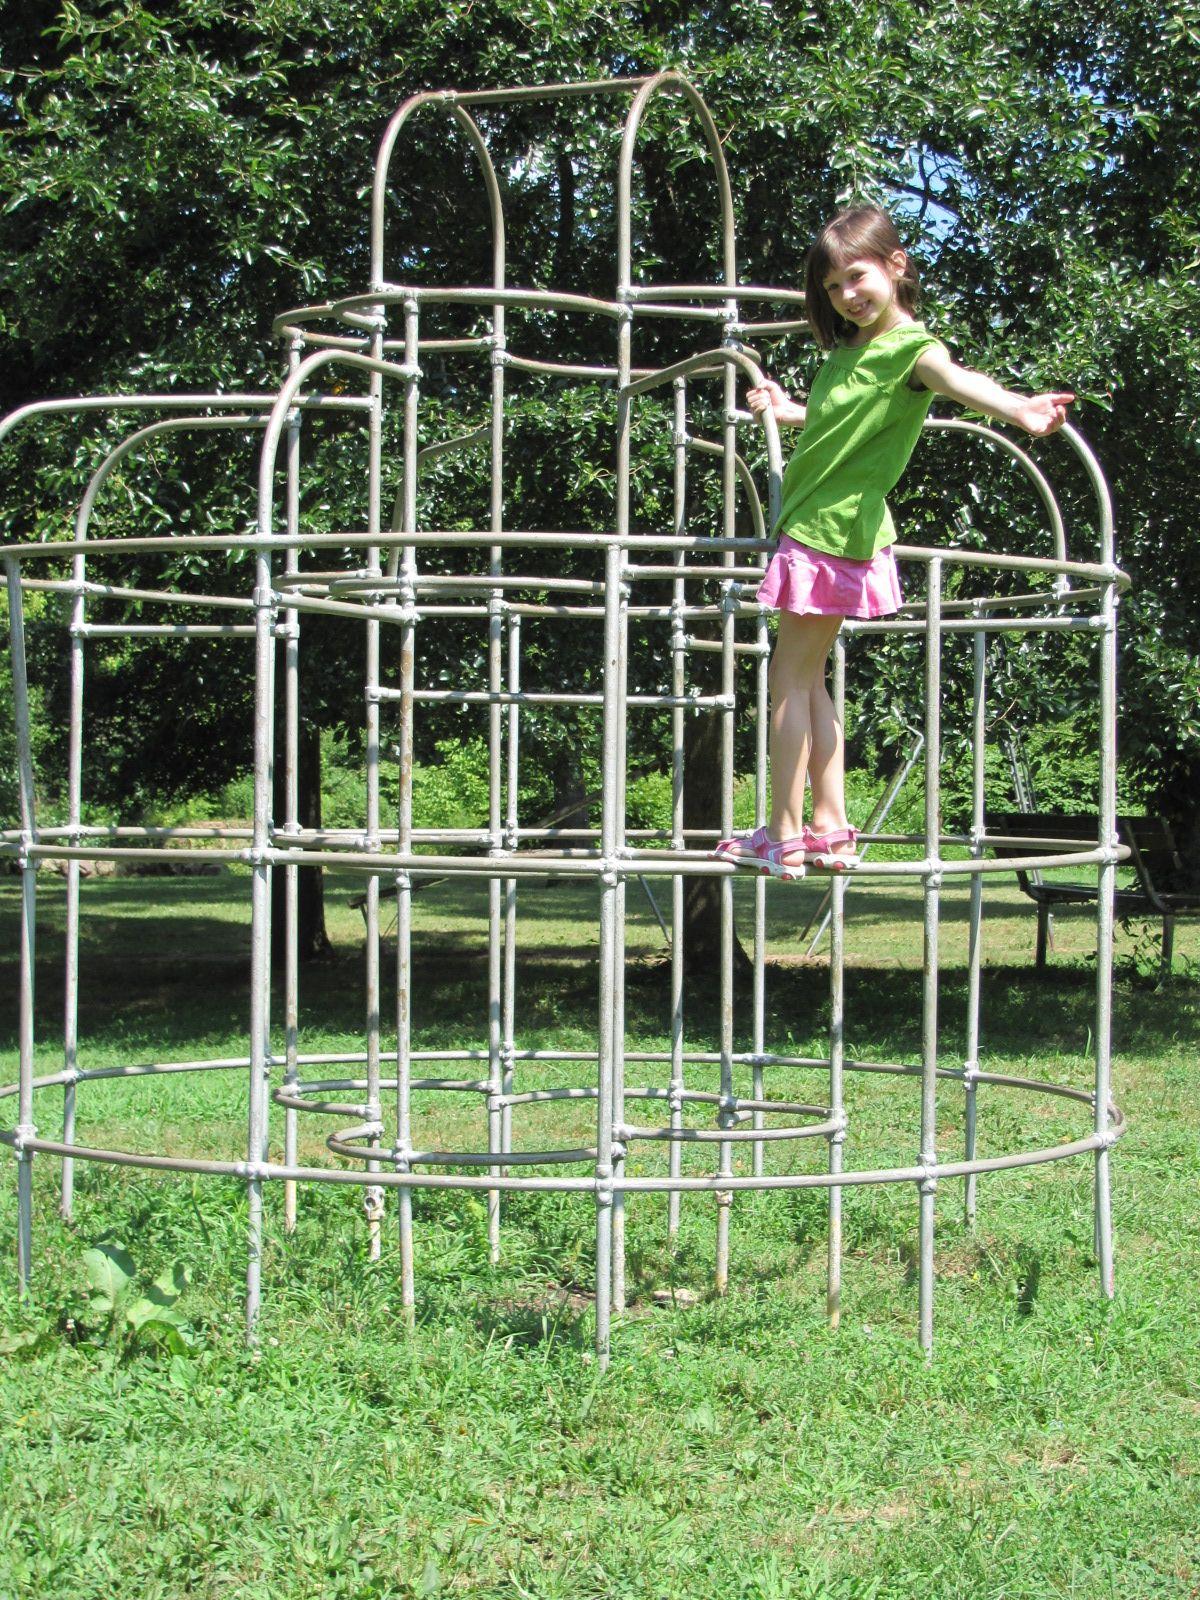 Bucks County Folk Art A Vintage Playground And Fairy Walk Childhood Memories Childhood Playground